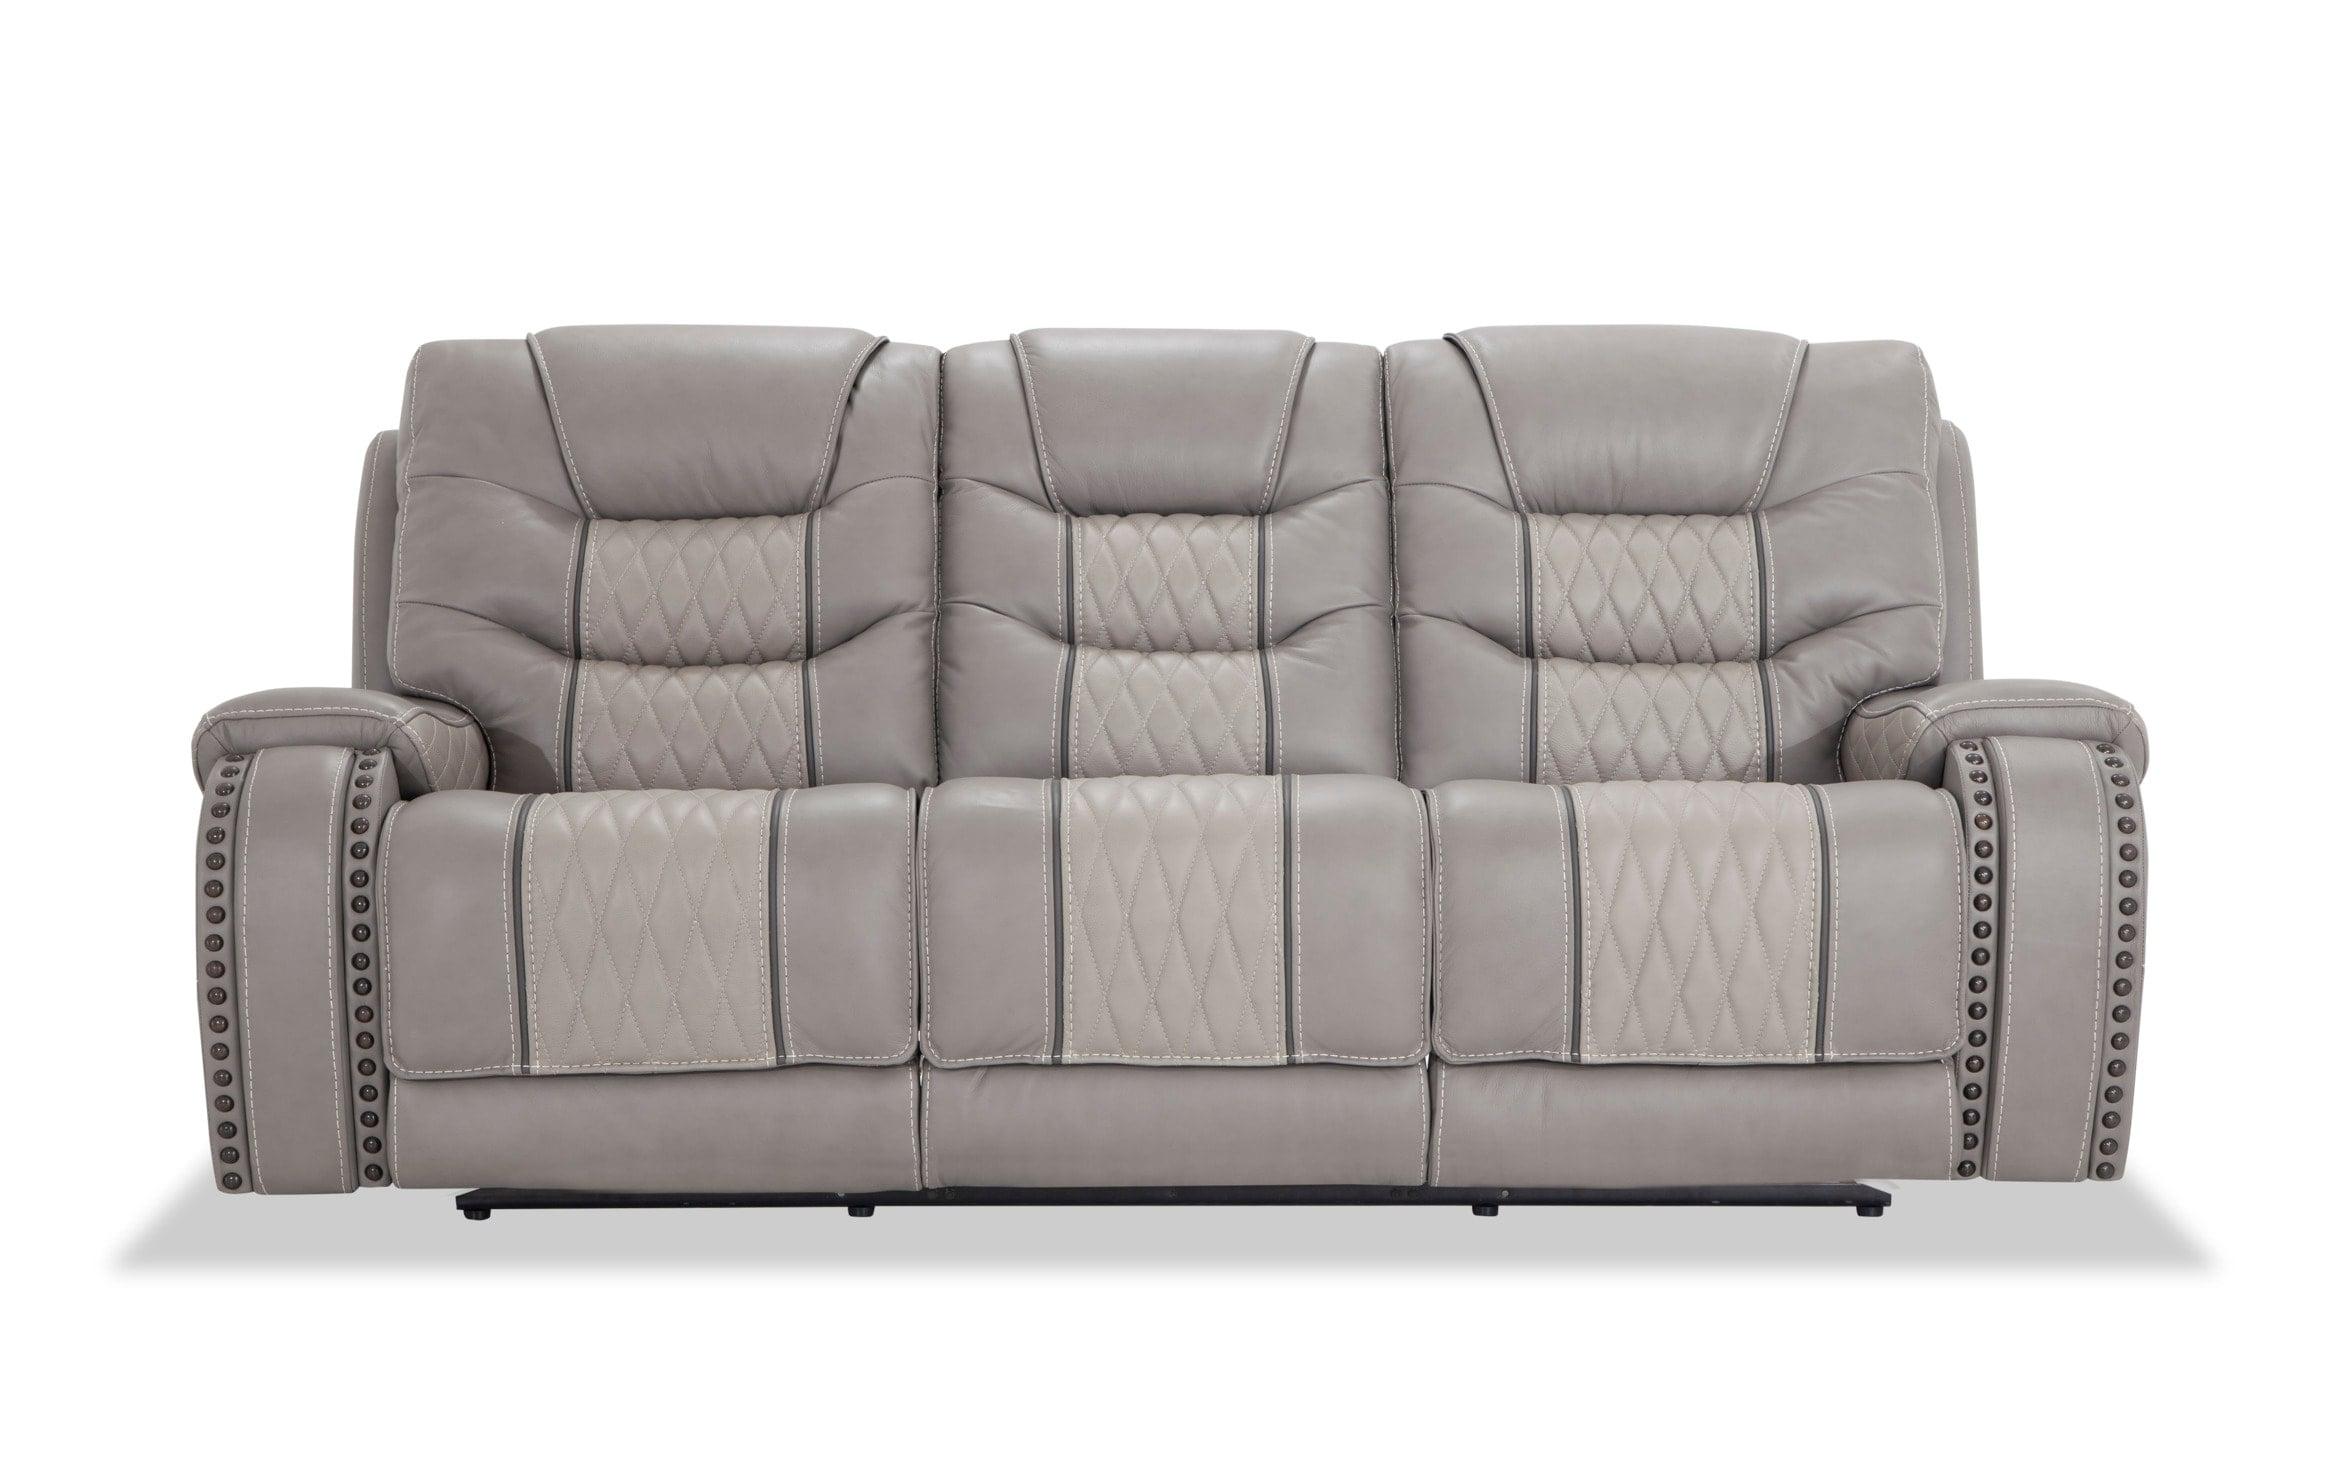 Bobs Furniture Leather Sofa : Trailblazer Gray Leather Pertaining To Trailblazer Gray Leather Power Reclining Sofas (View 3 of 15)